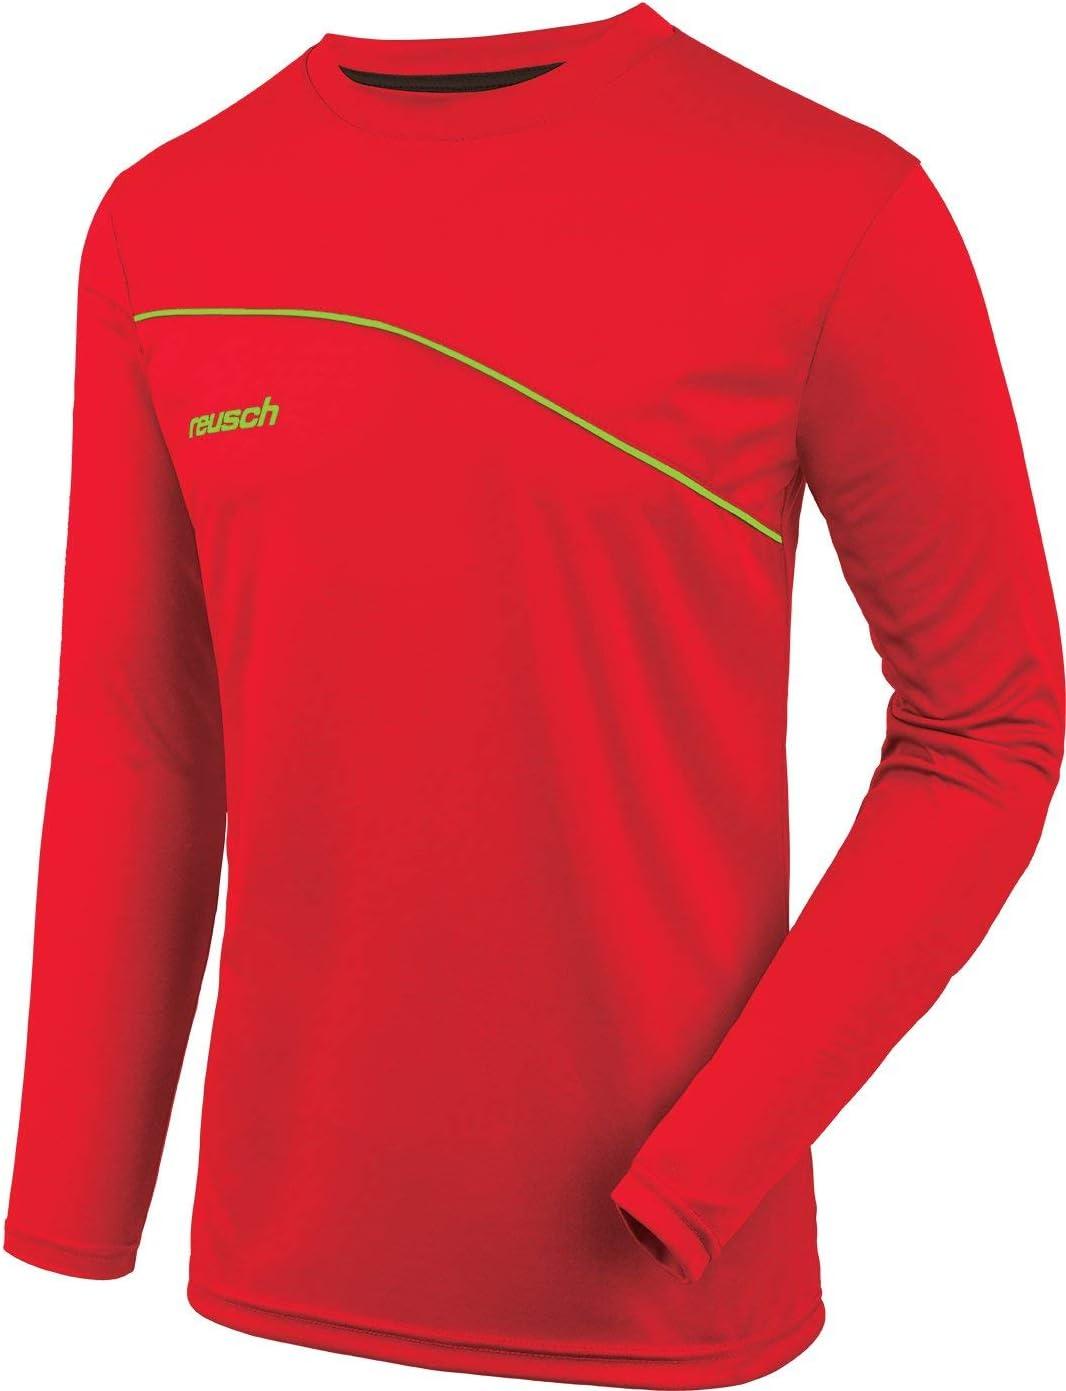 Reusch Match Camiseta de Manga Larga Acolchada para Hombre